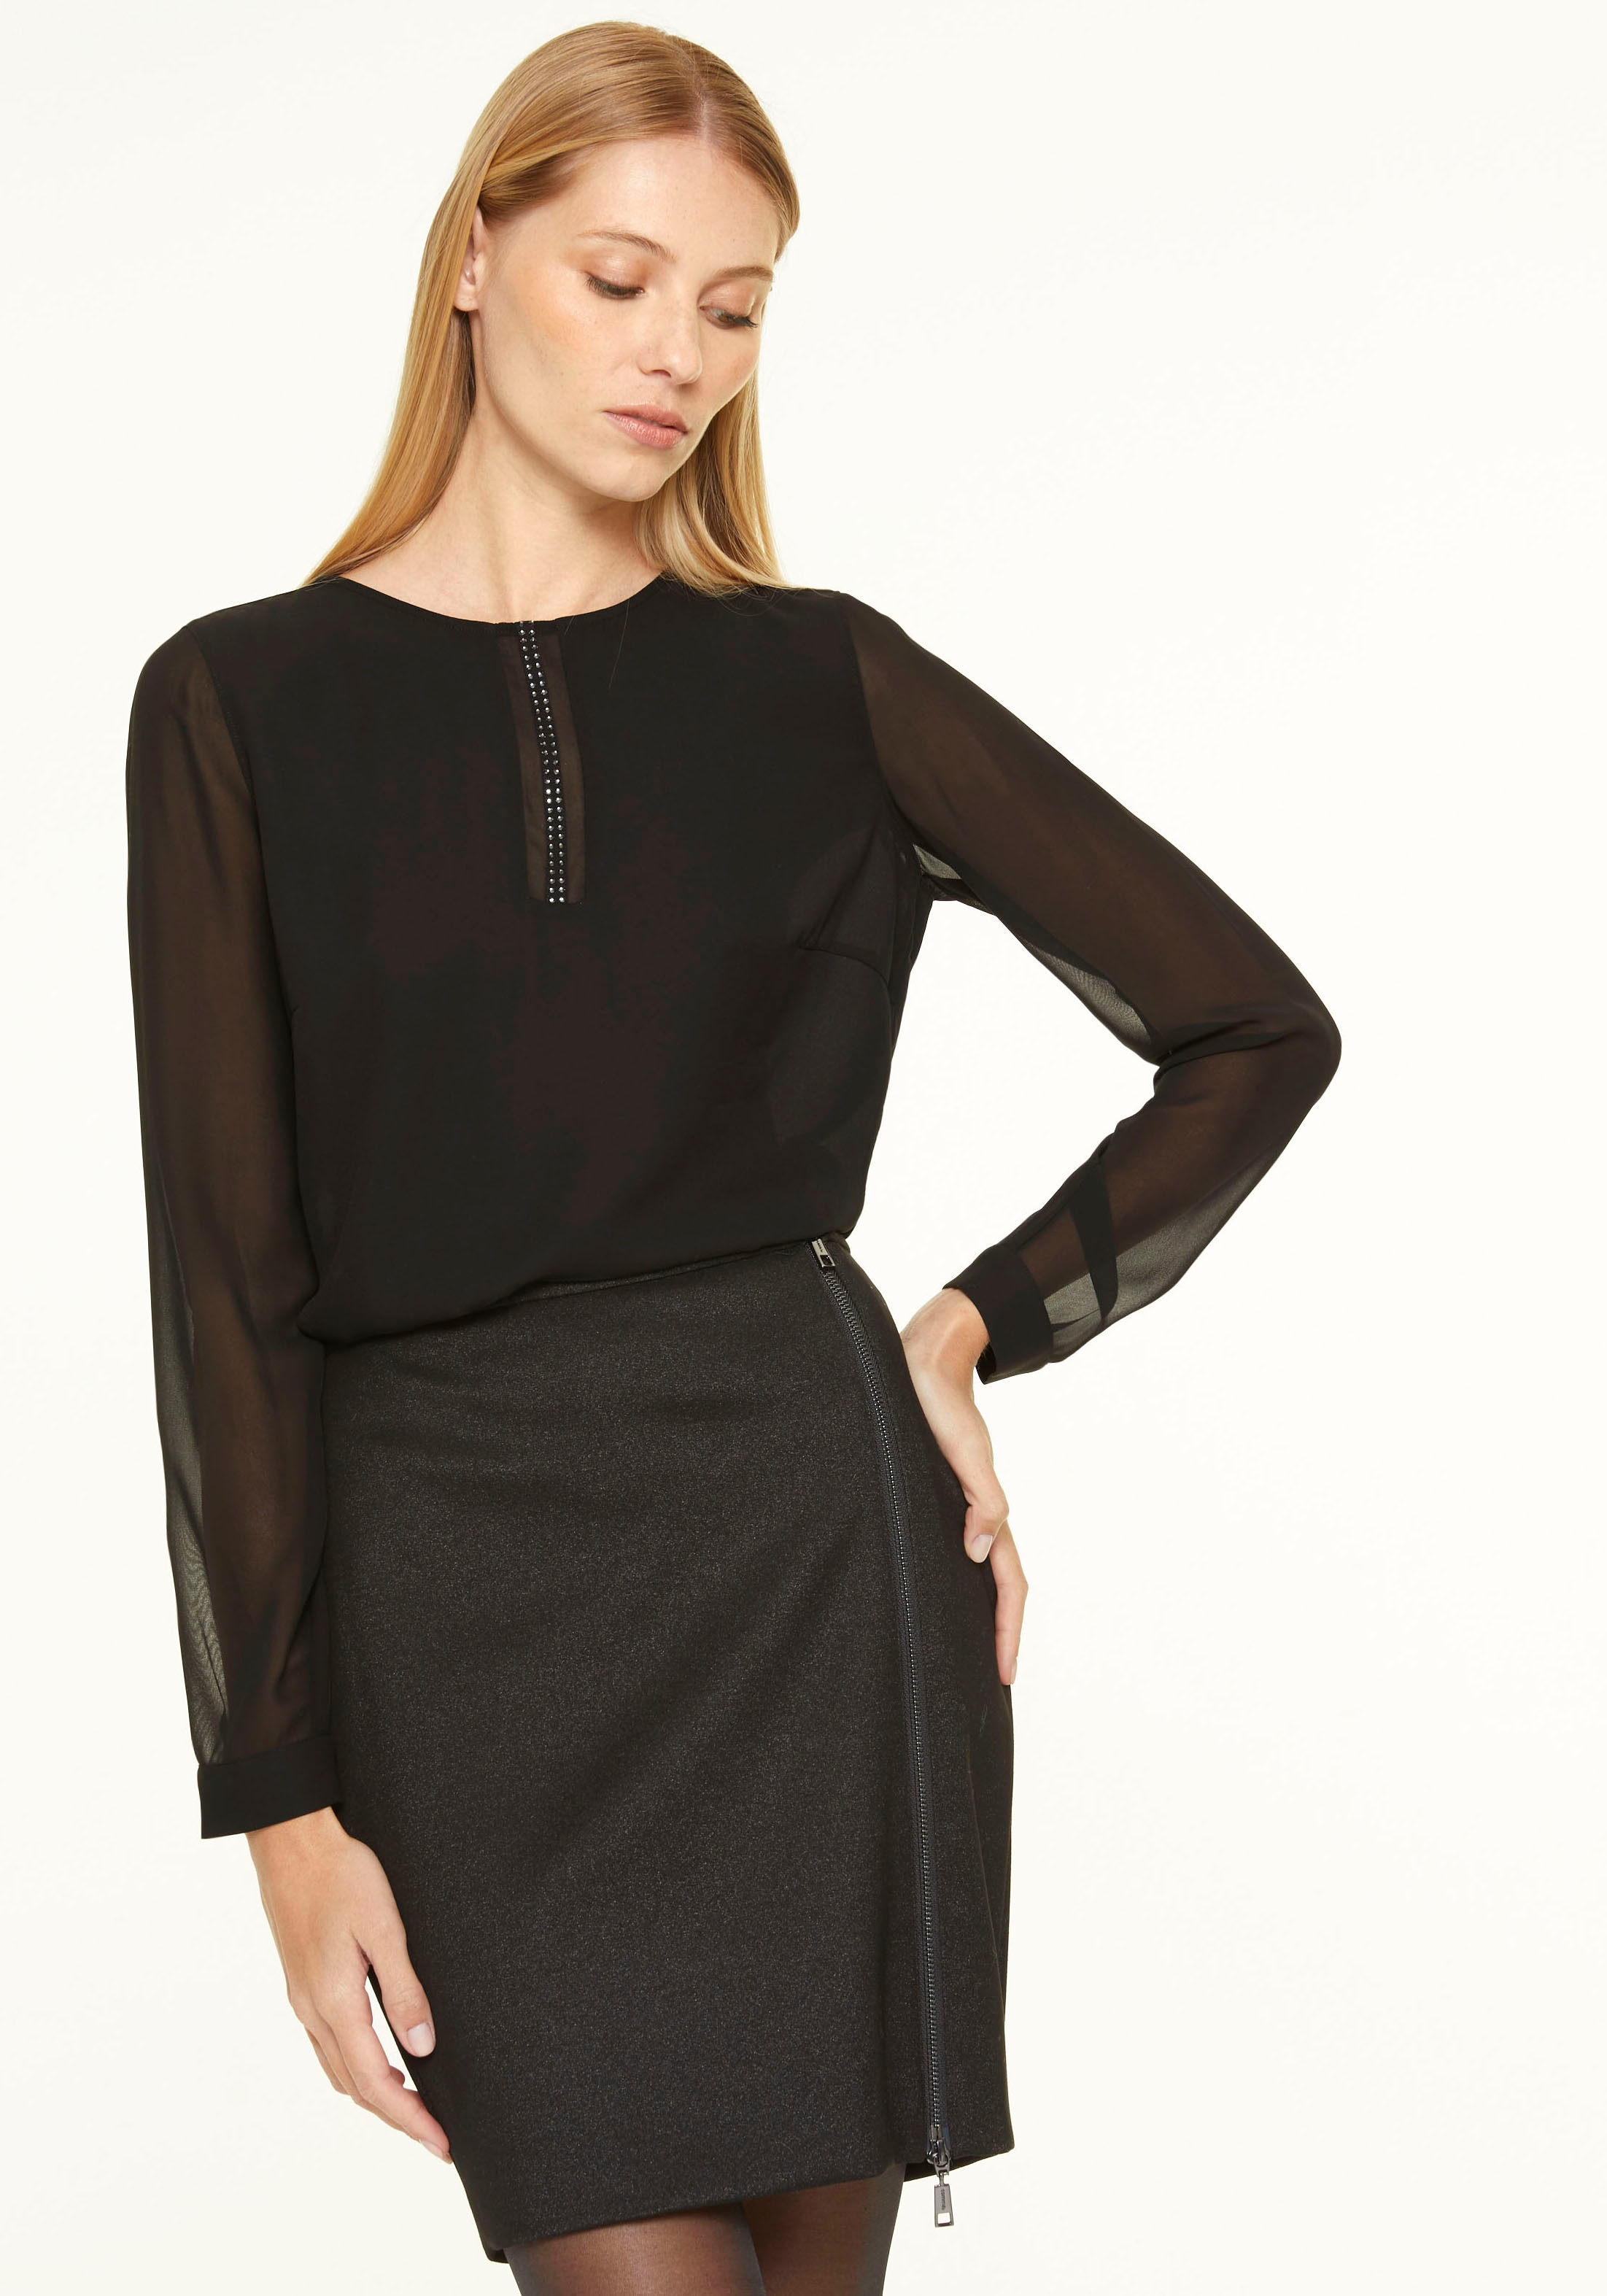 Comma Chiffonbluse, mit Swarovski-Kristallen schwarz Damen langarm Blusen Tuniken Chiffonbluse